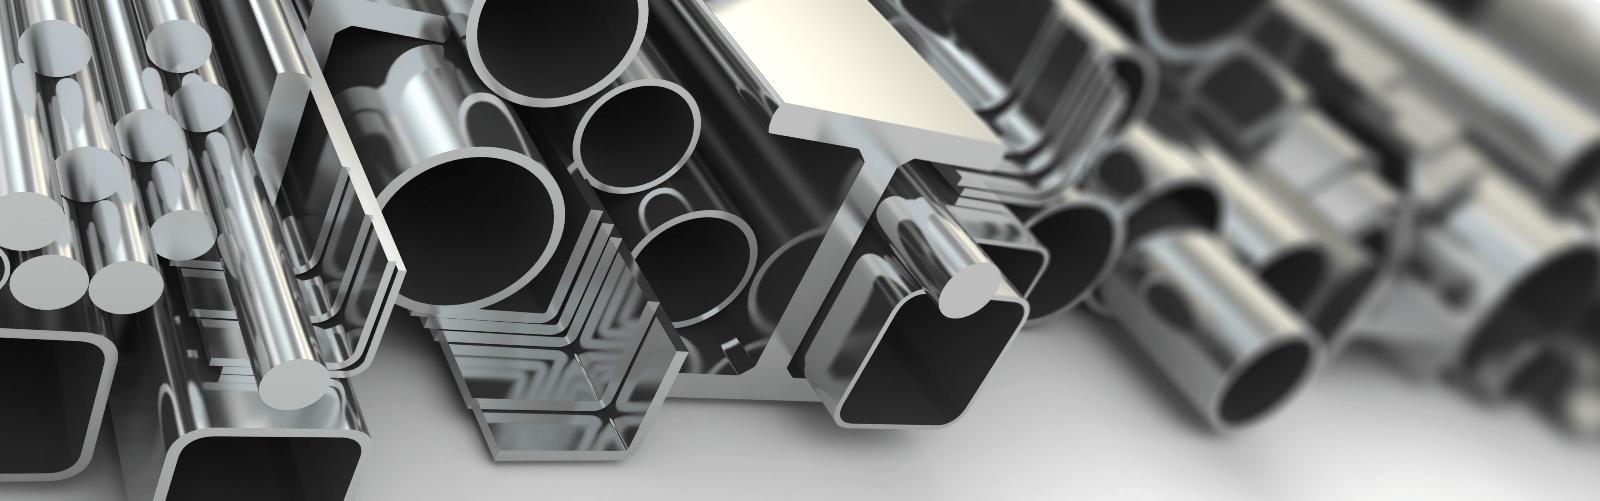 Фото металла